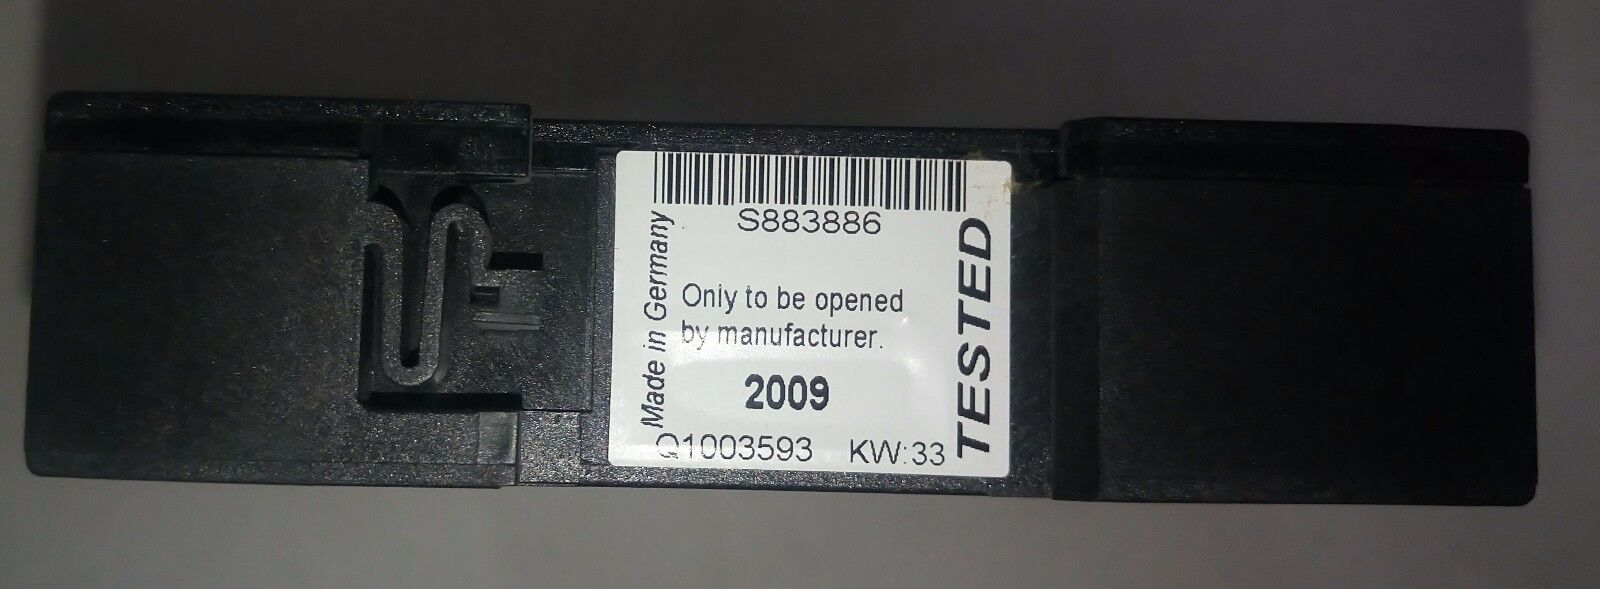 Schmersal SRB201ZH 24VDC parte de no 101163440 Controlador de parte seguridad SRB a1f3da